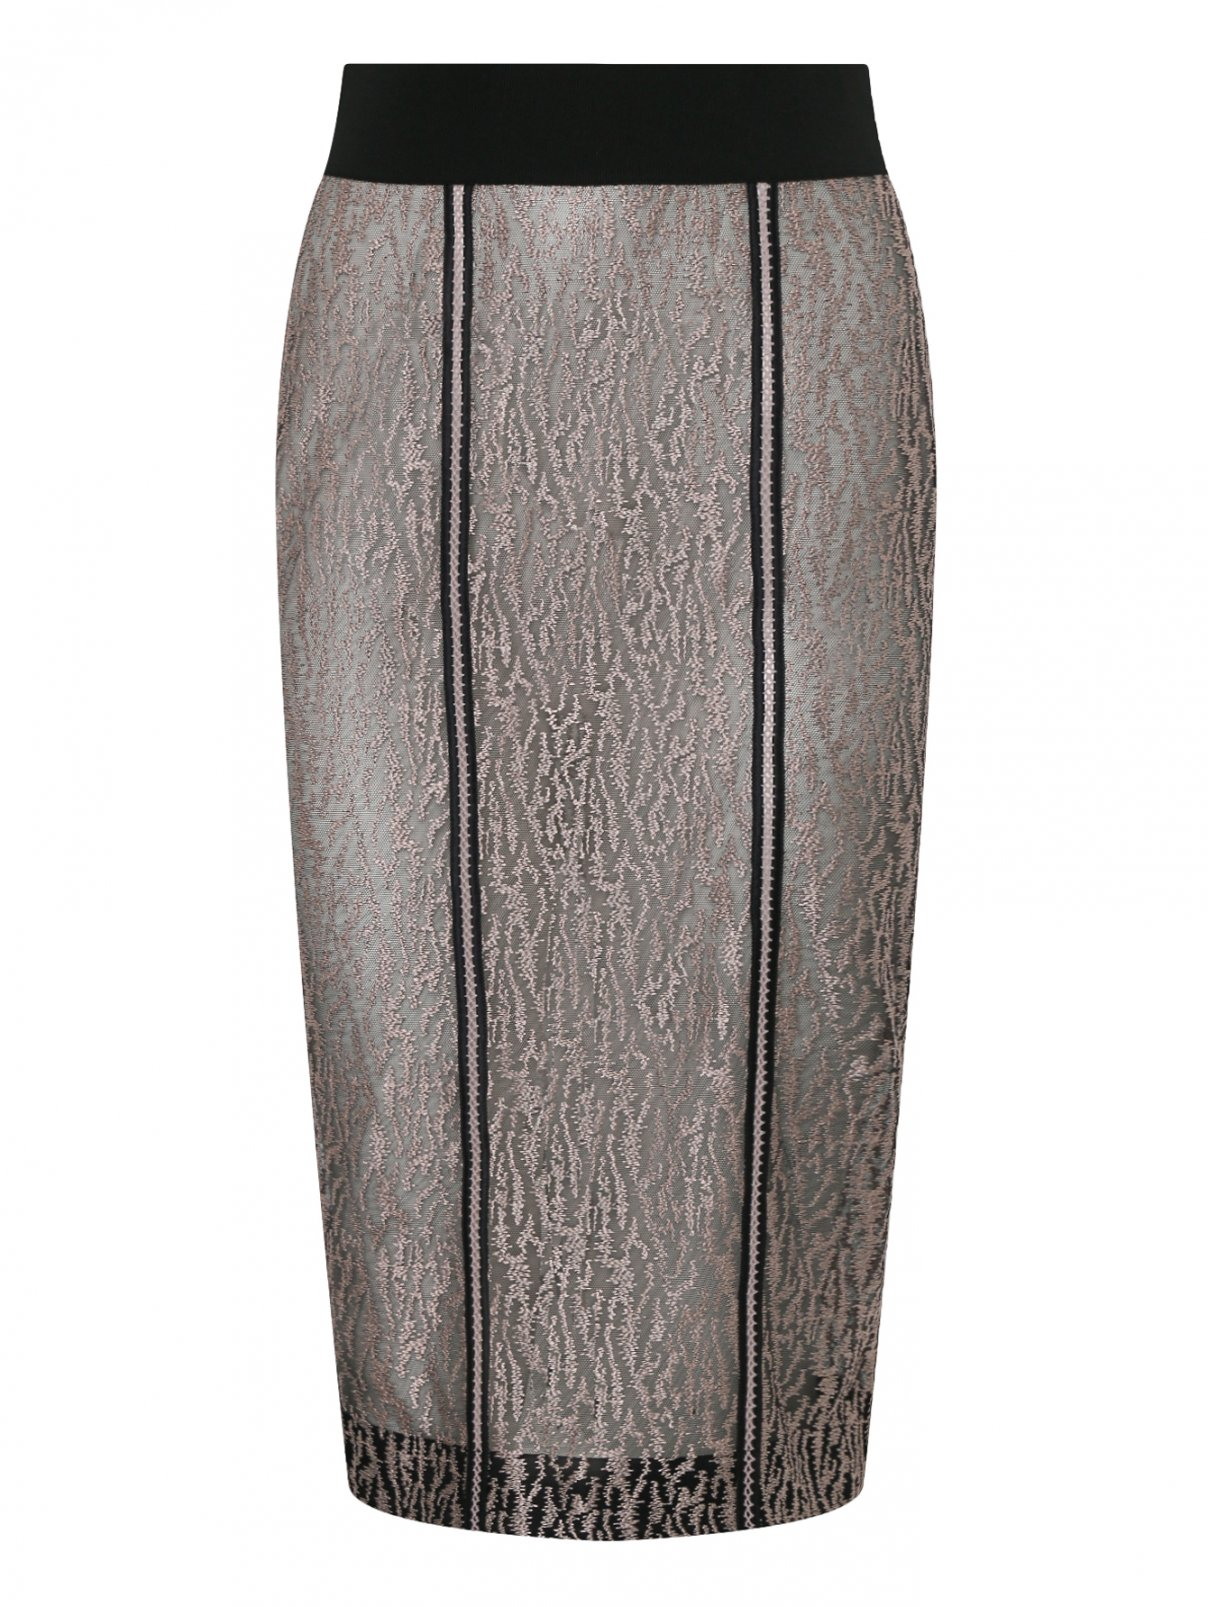 Юбка-карандаш с узором La Perla  –  Общий вид